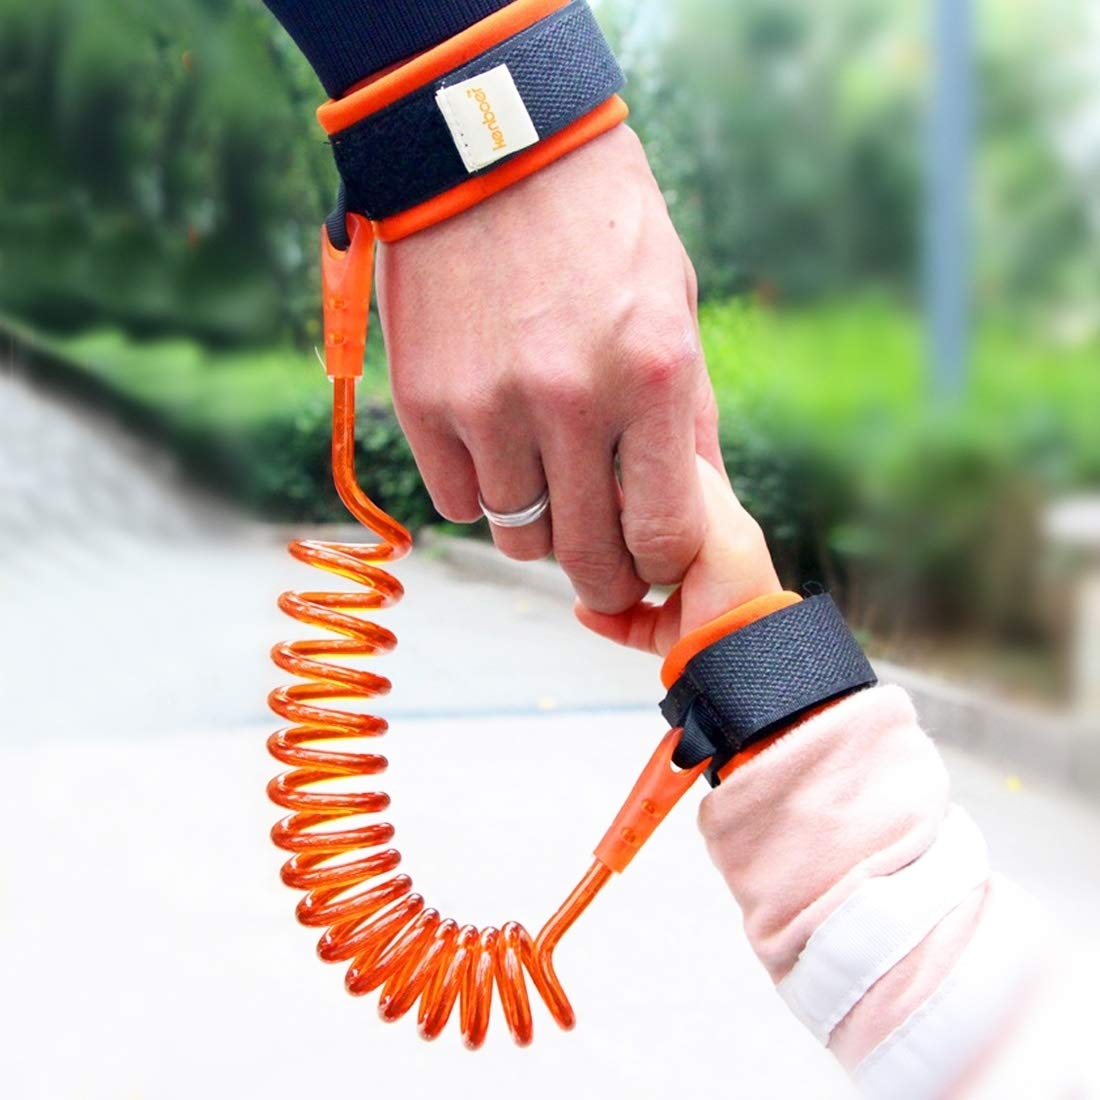 Caofeng Kids Safety Harness Child Leash Anti Lost Wrist Link Traction Rope Anti Lost Bracelet, Length: 2.5m (Orange) (Color : Orange)